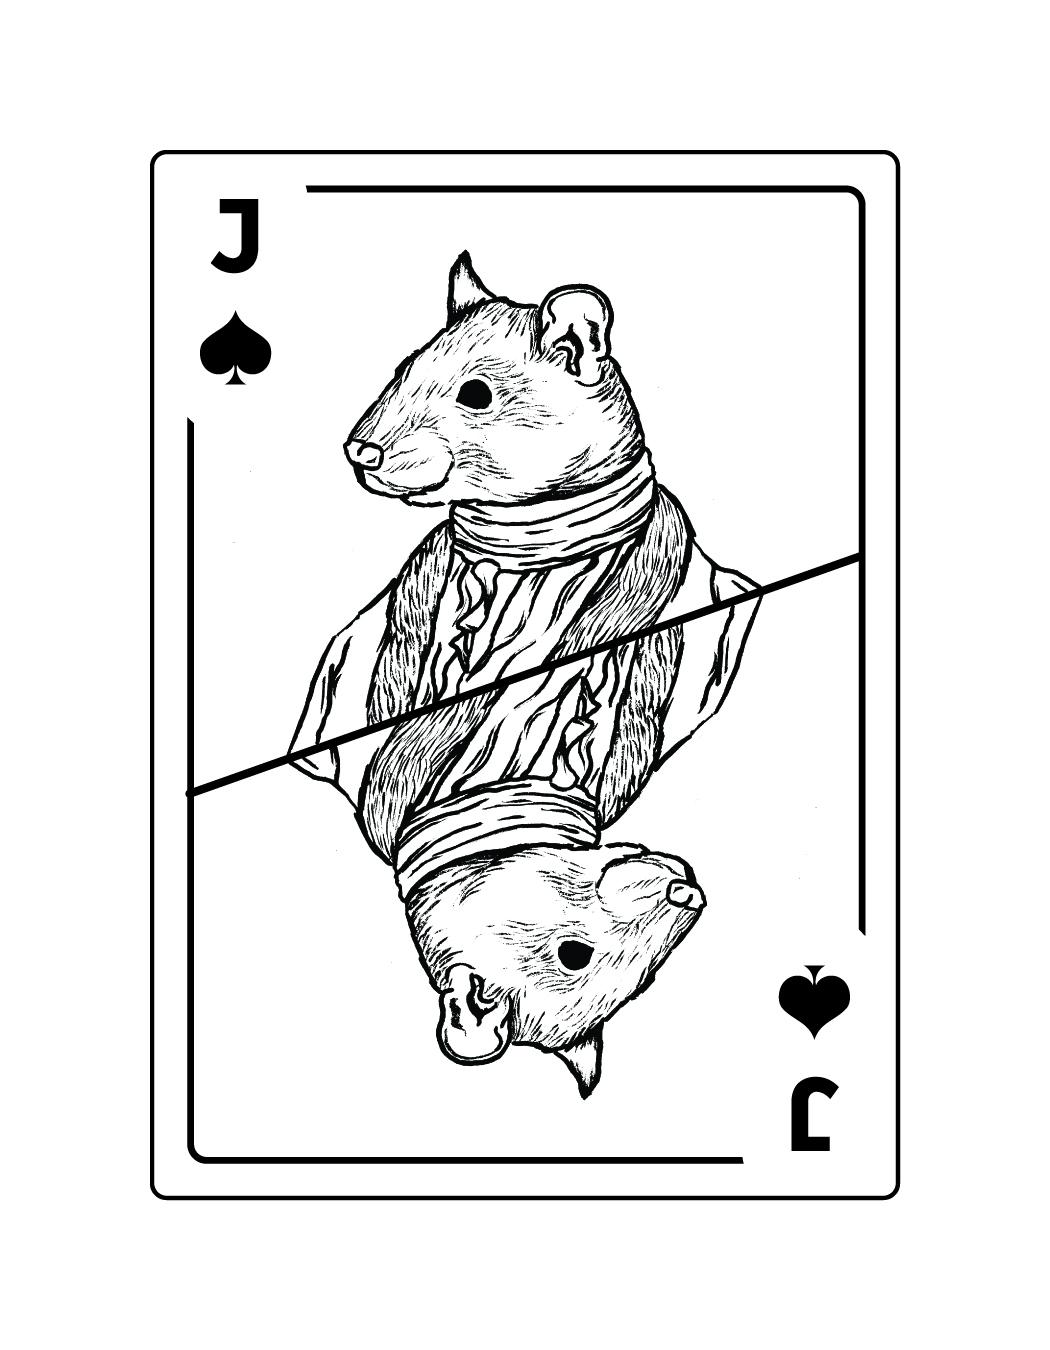 card_draft_1-42.jpg